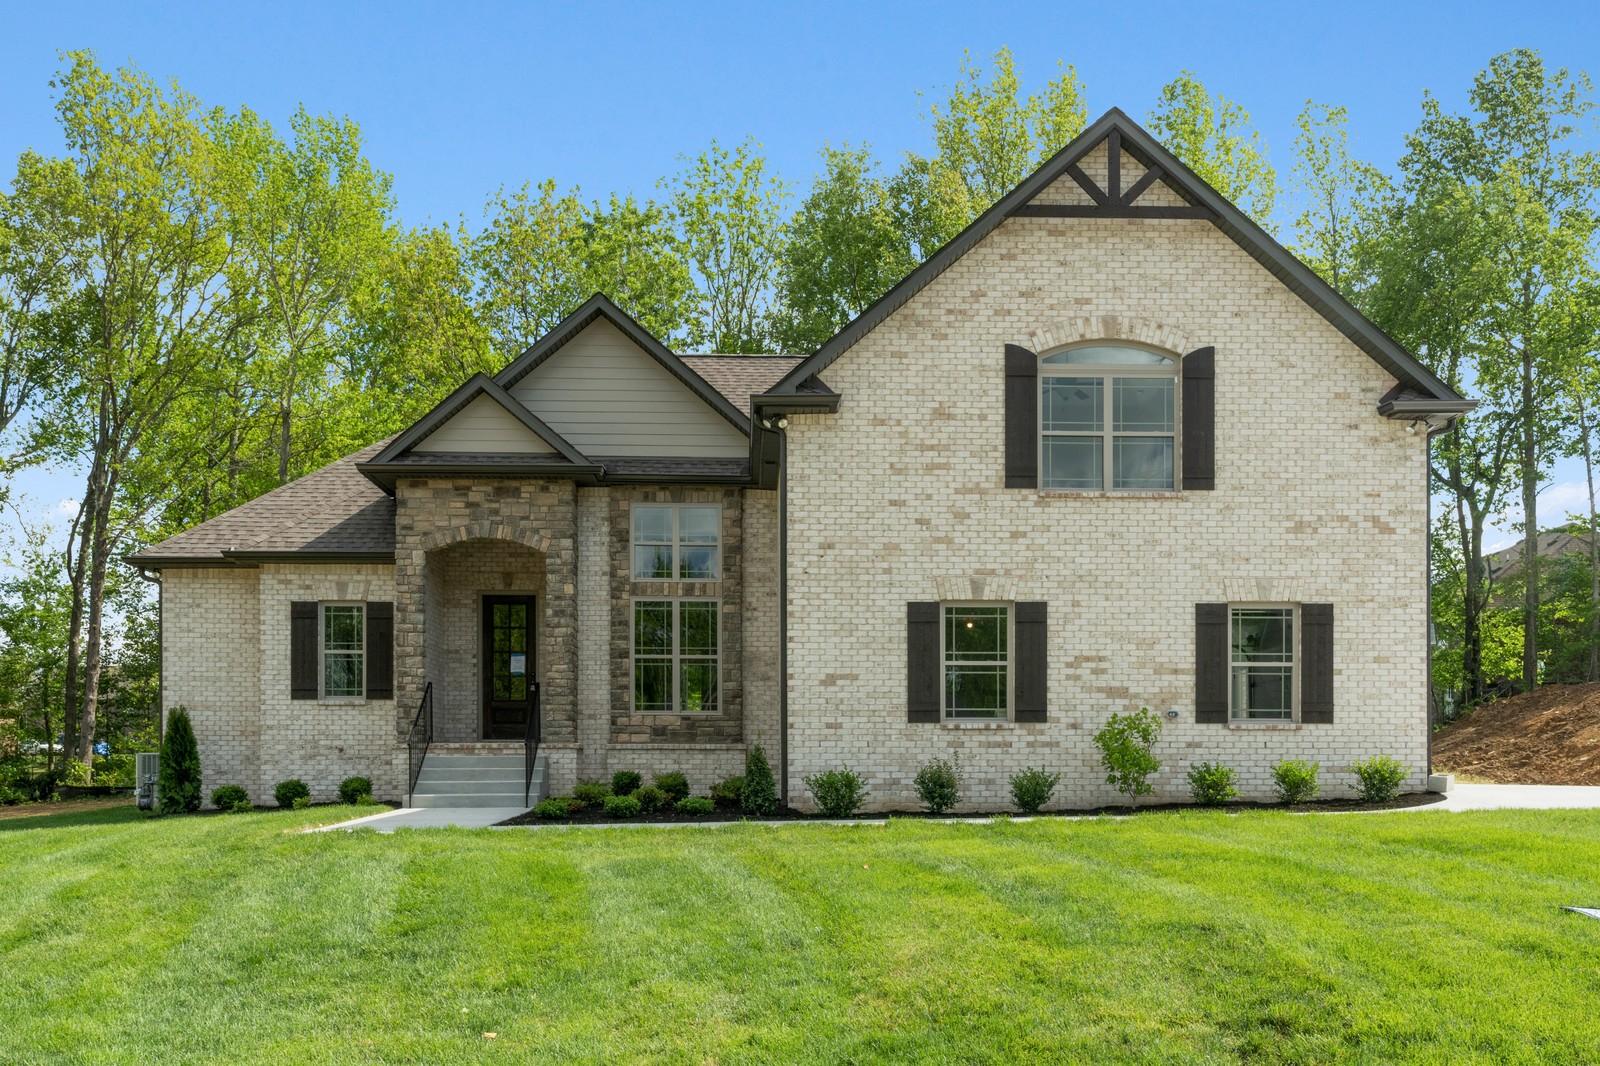 5039 East Mayflower Ct. , Greenbrier, TN 37073 - Greenbrier, TN real estate listing